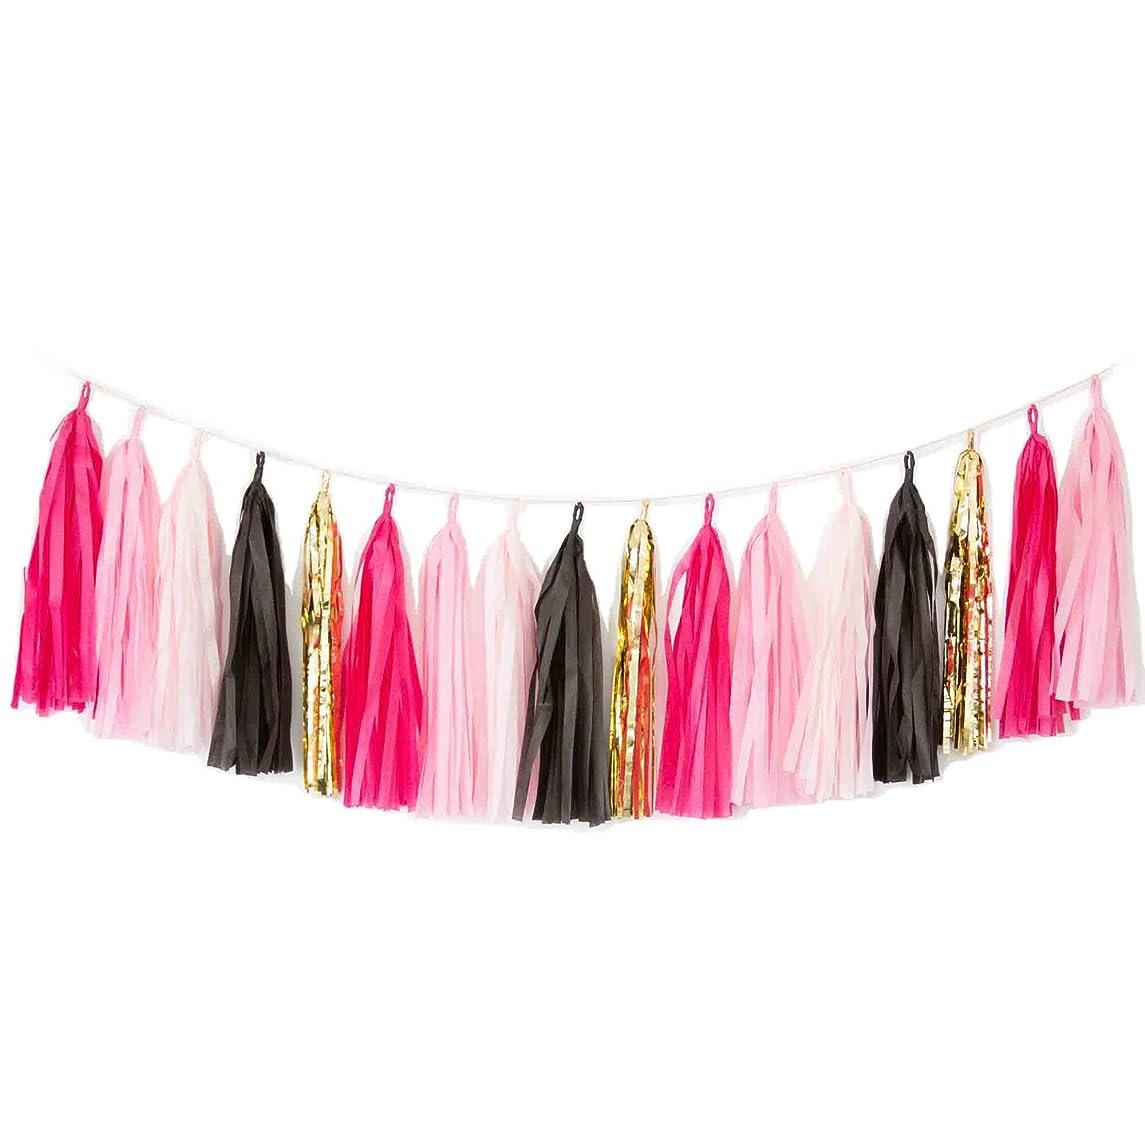 Blush Bazaar Gold Tassel Garland, Hot Pink/Pink/Blush/Black